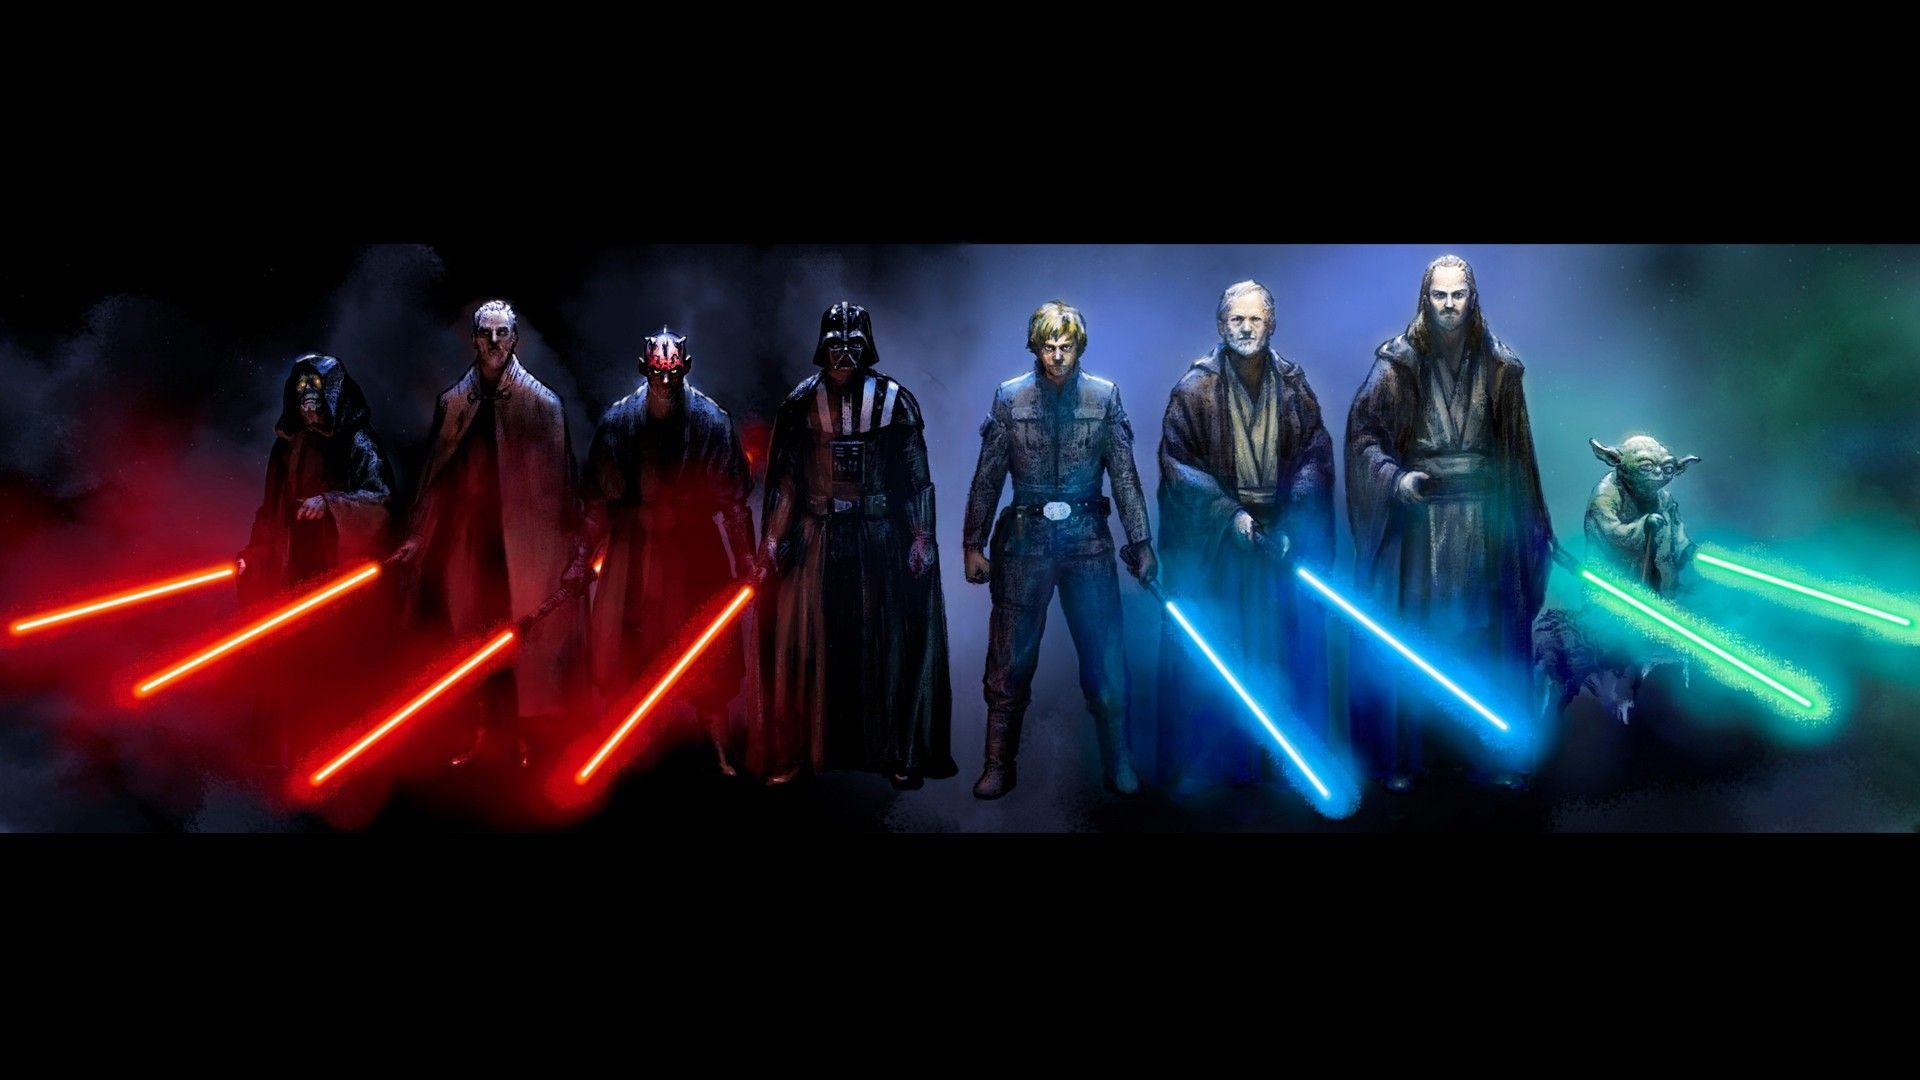 Star Wars Female Jedi